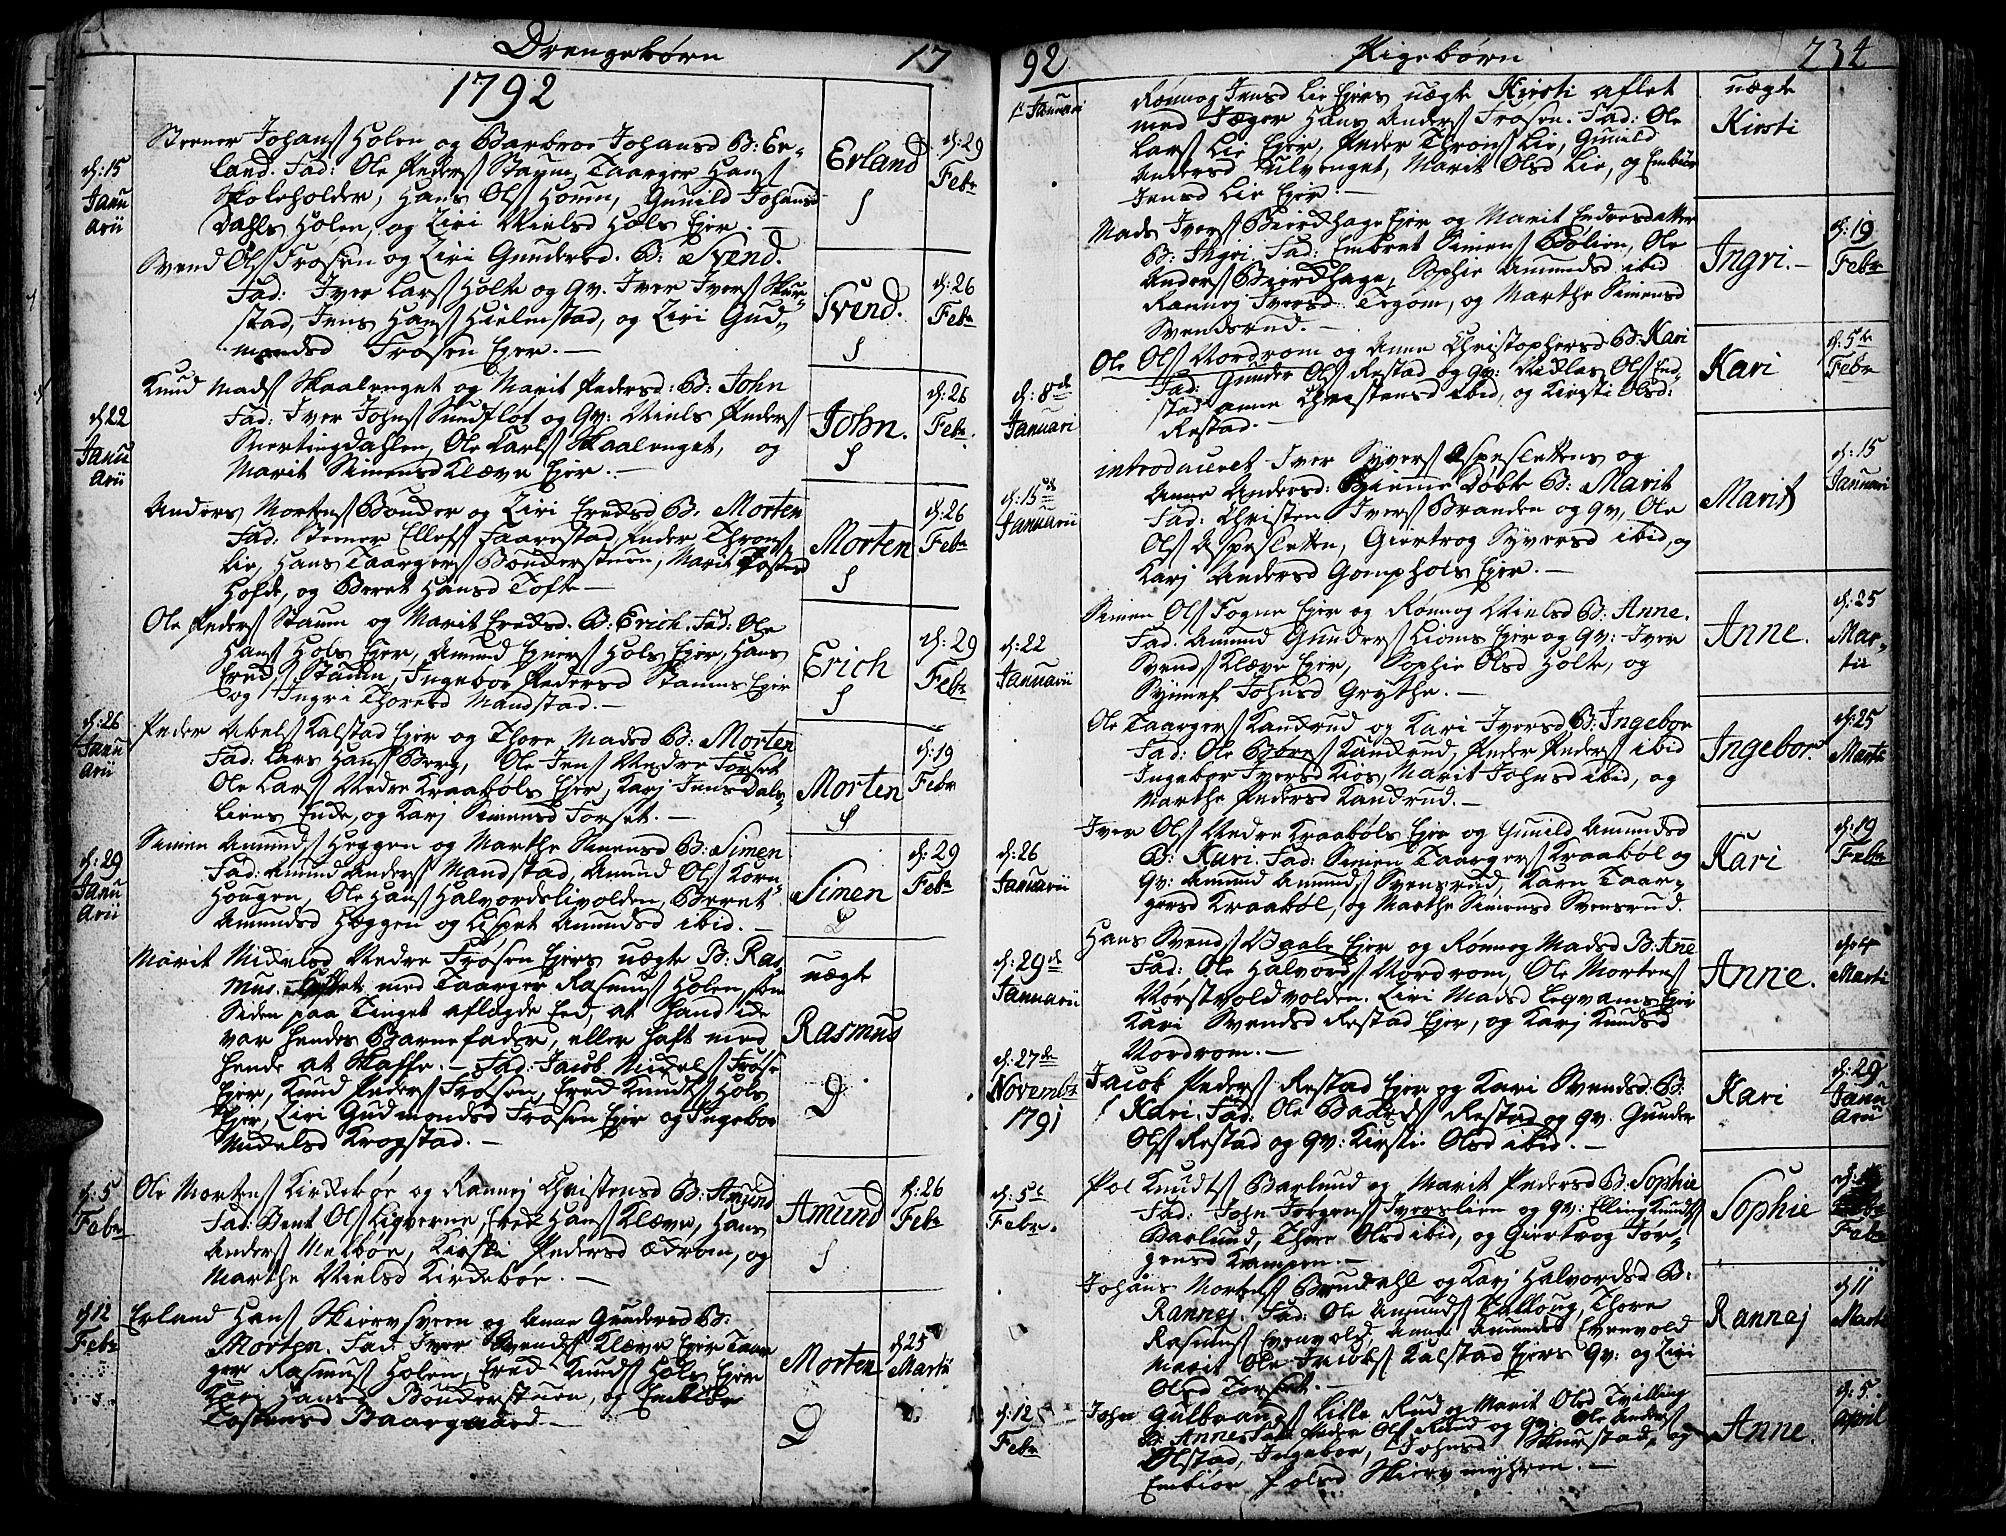 SAH, Gausdal prestekontor, Ministerialbok nr. 3, 1758-1809, s. 234